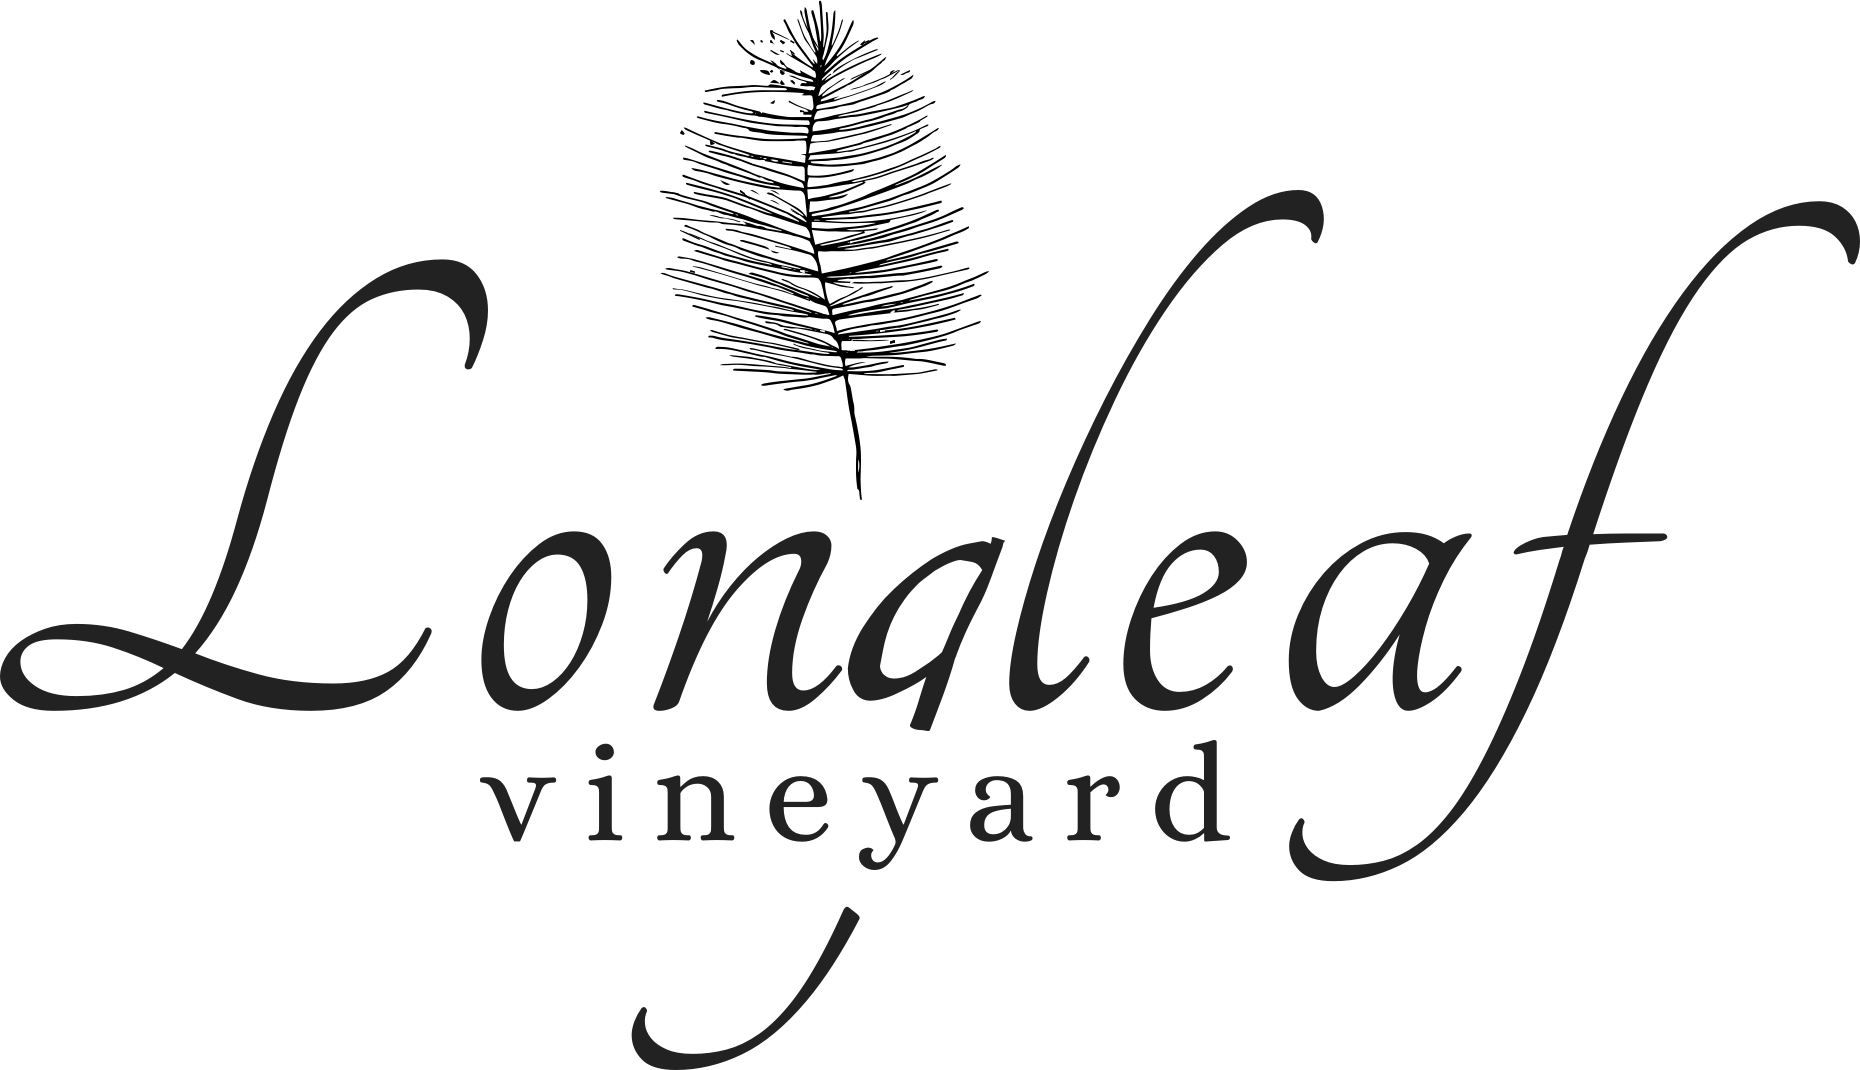 longleaf-logo-vineyard-asheville-wedding-events